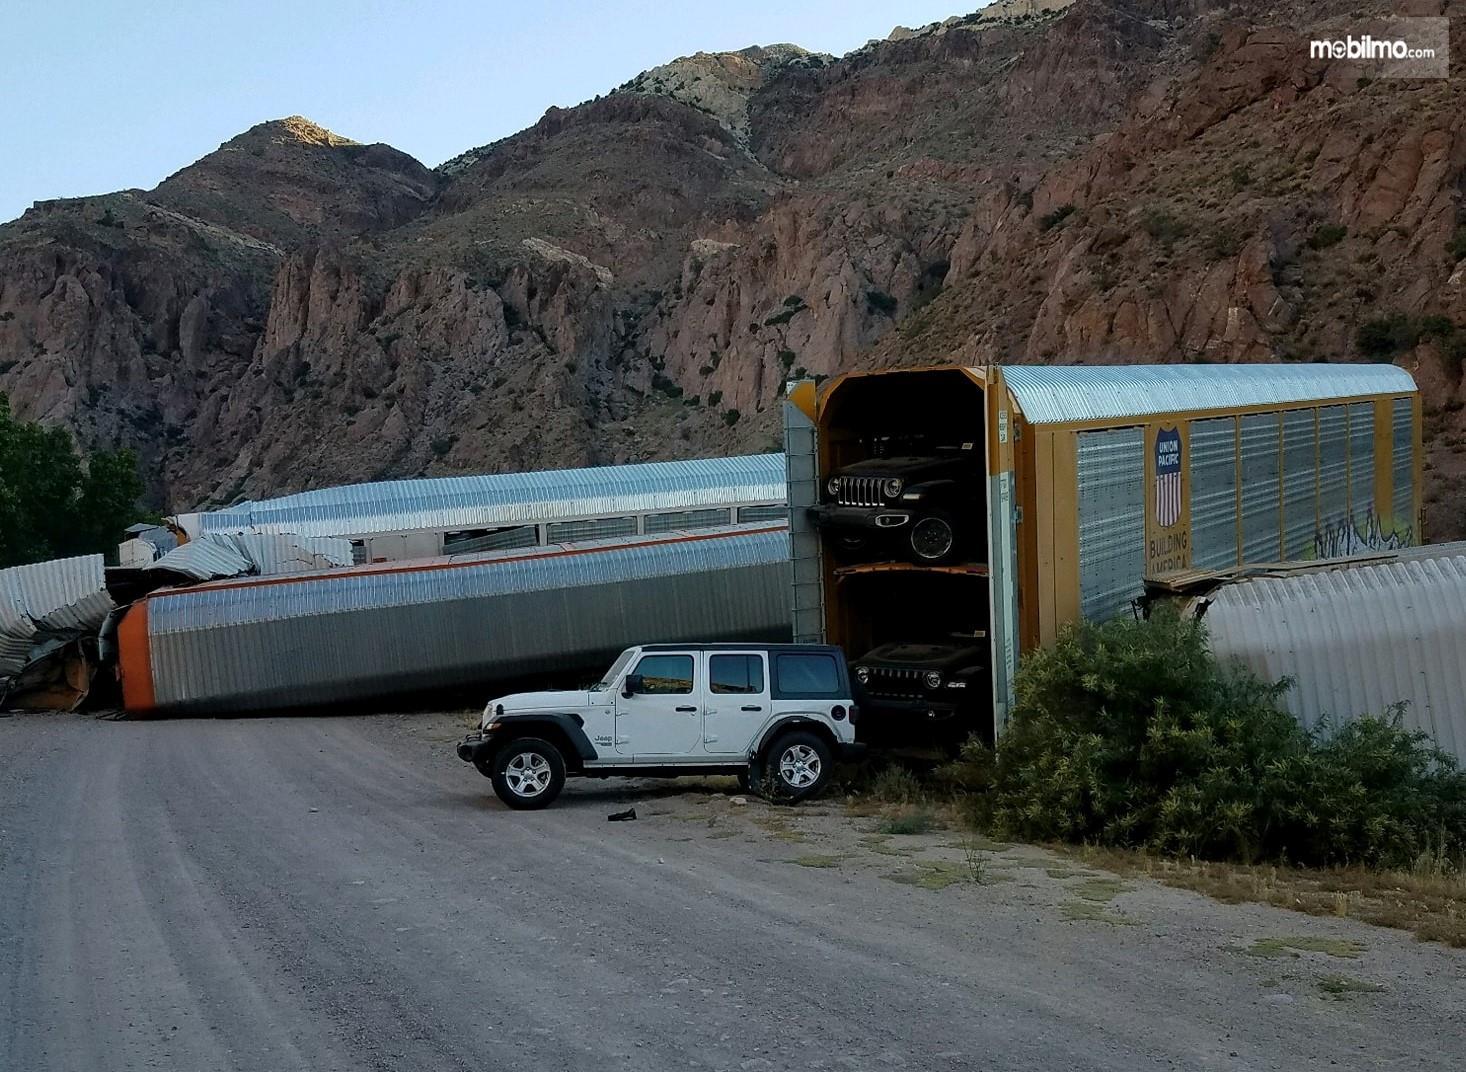 Foto menunjukkan sejumlah mobil mahal rusak parah dalam peristiwa kecelakaan kereta api di Nevada Amerika Serikat